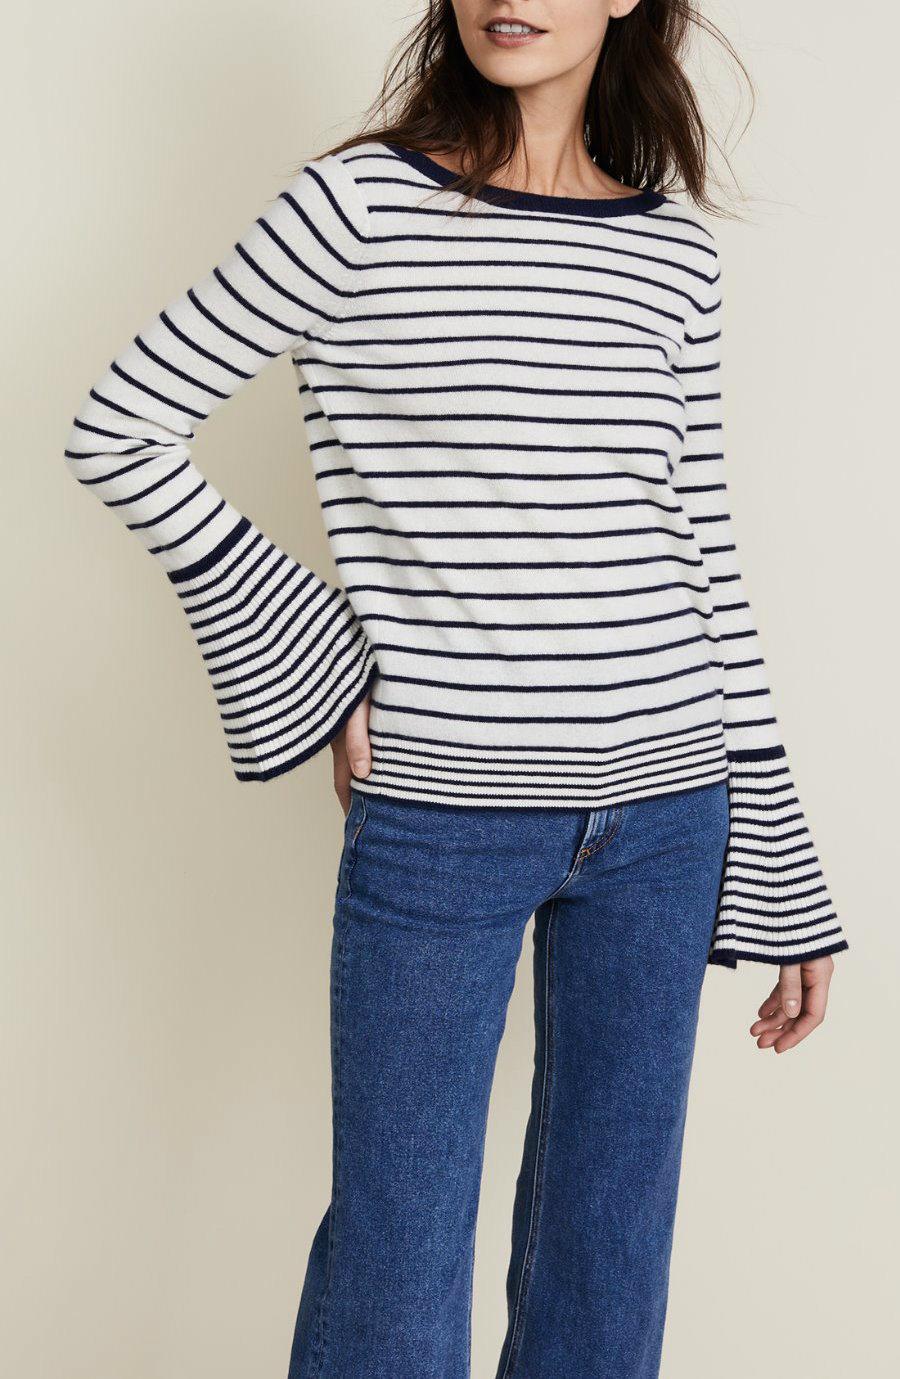 69c1b2cf46 China Stripe T-Shirt, Stripe T-Shirt Manufacturers, Suppliers, Price |  Made-in-China.com